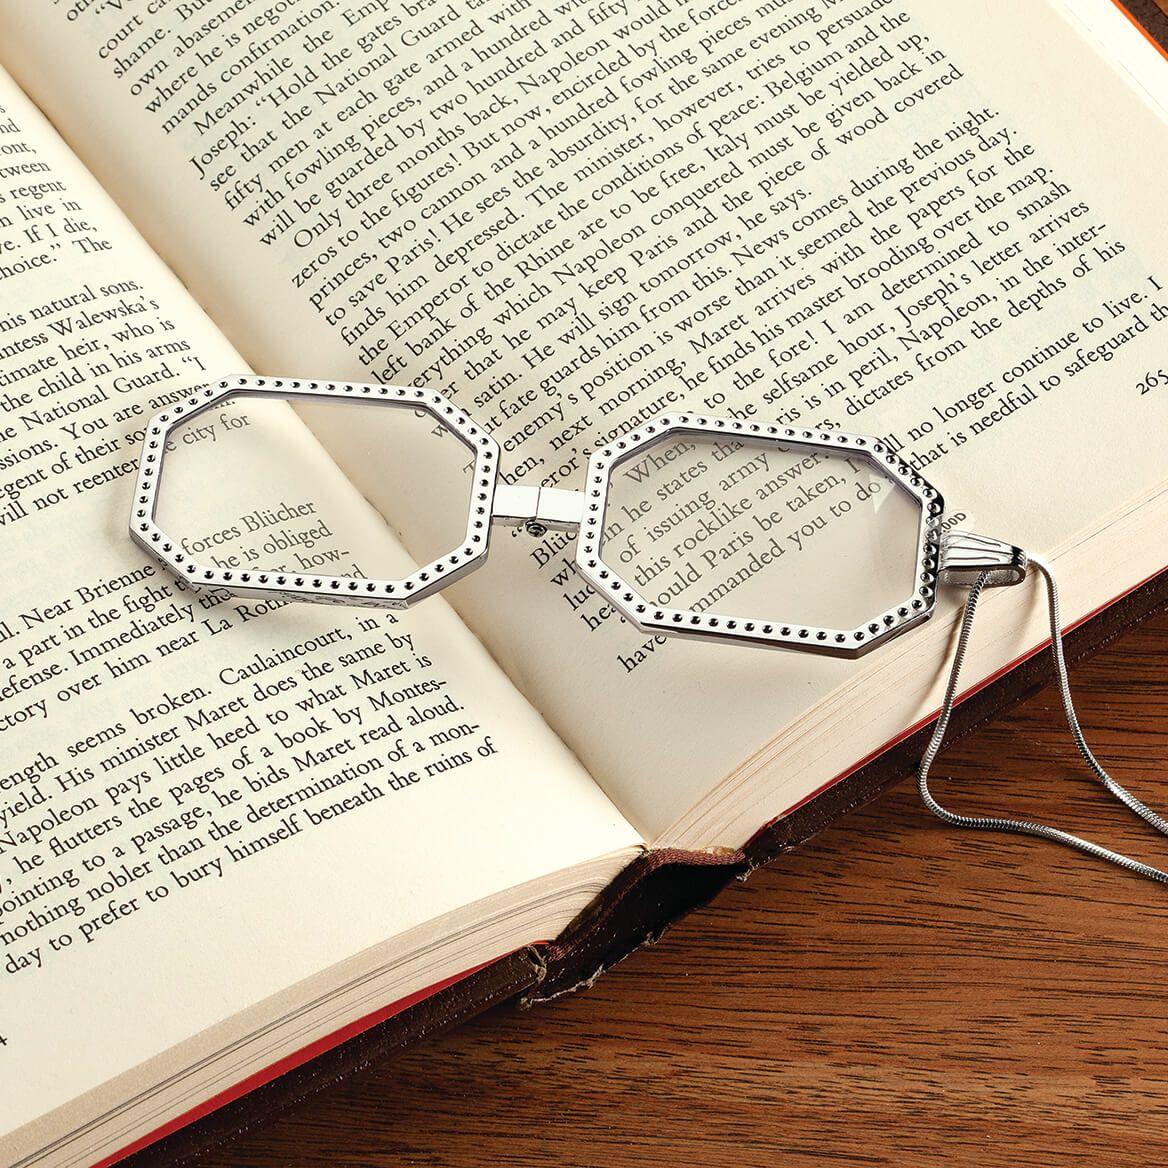 Dianna Locket Reading Glasses by Neckglasses™-371813